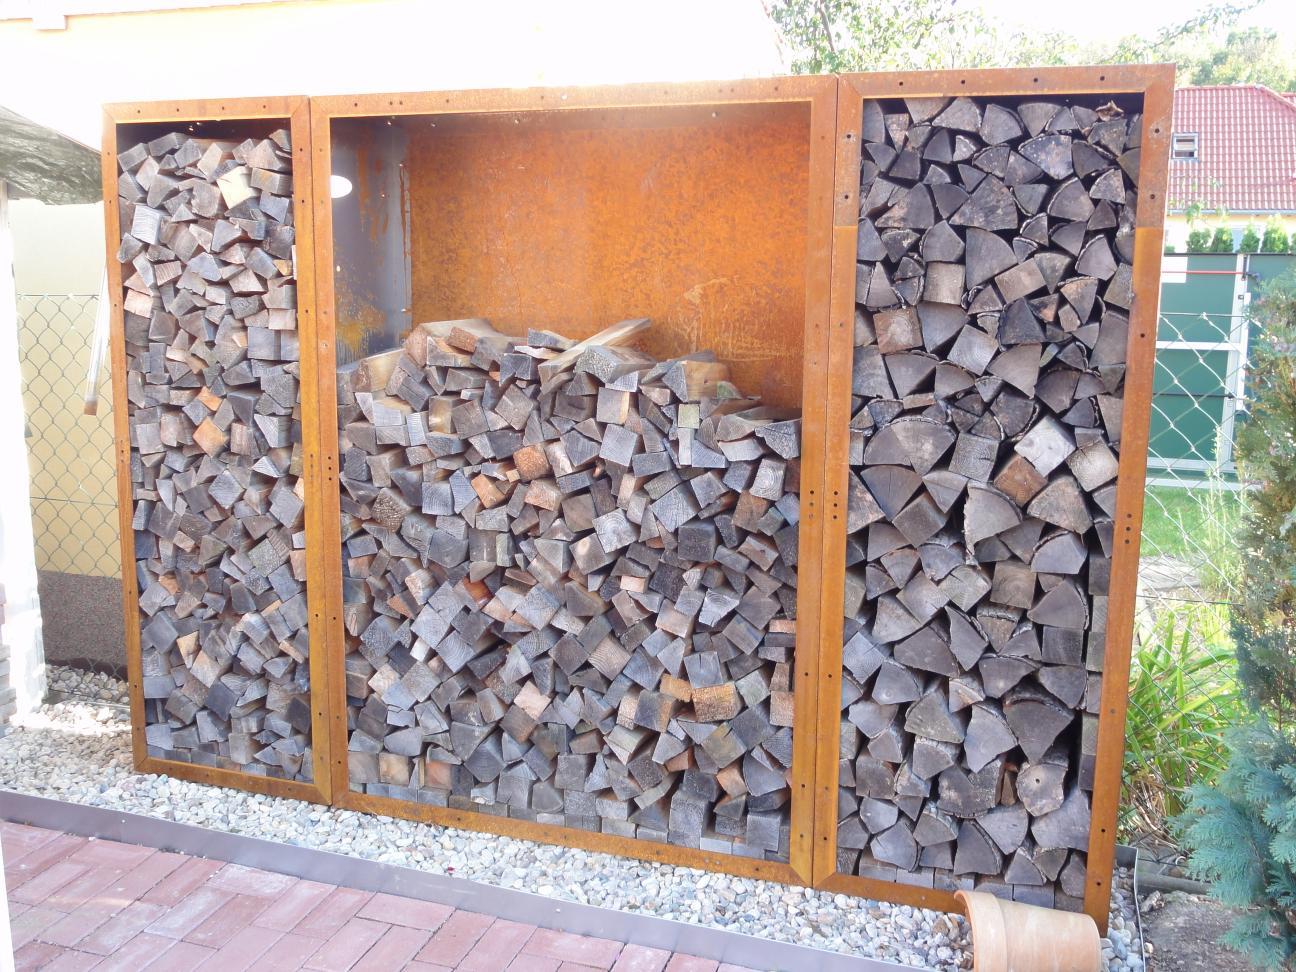 kaminholzregal metall 1 5 m x 1 2 m x 0 35 m oberfl che edelrost. Black Bedroom Furniture Sets. Home Design Ideas